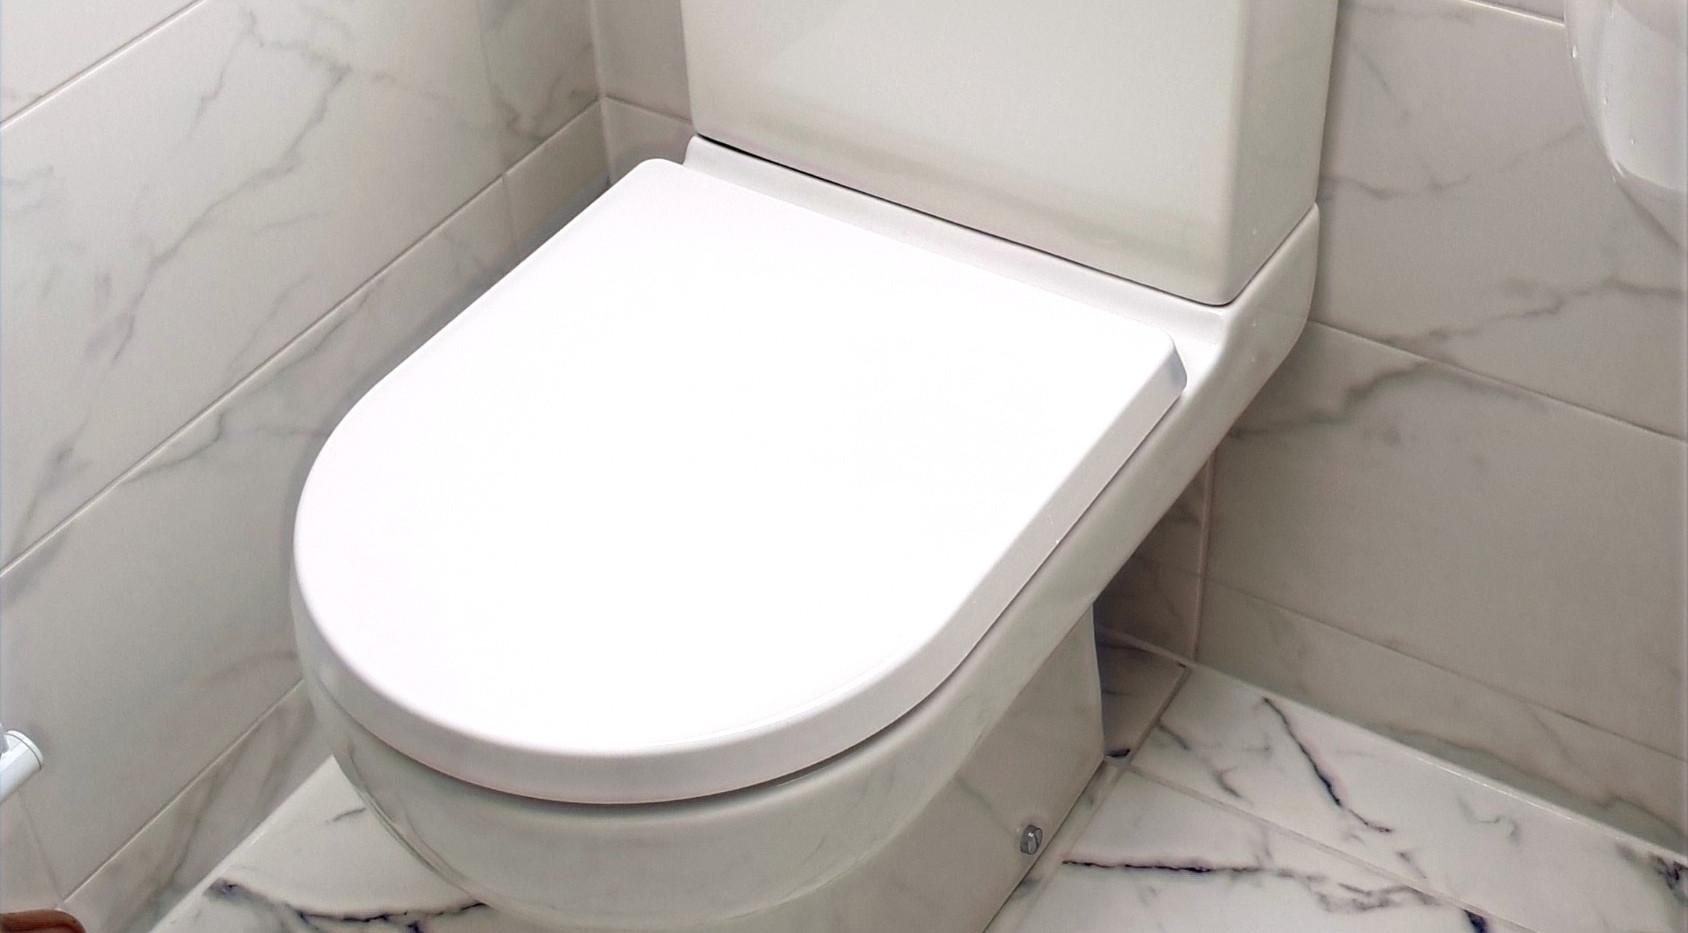 Cloakroom toilet tiling flooring